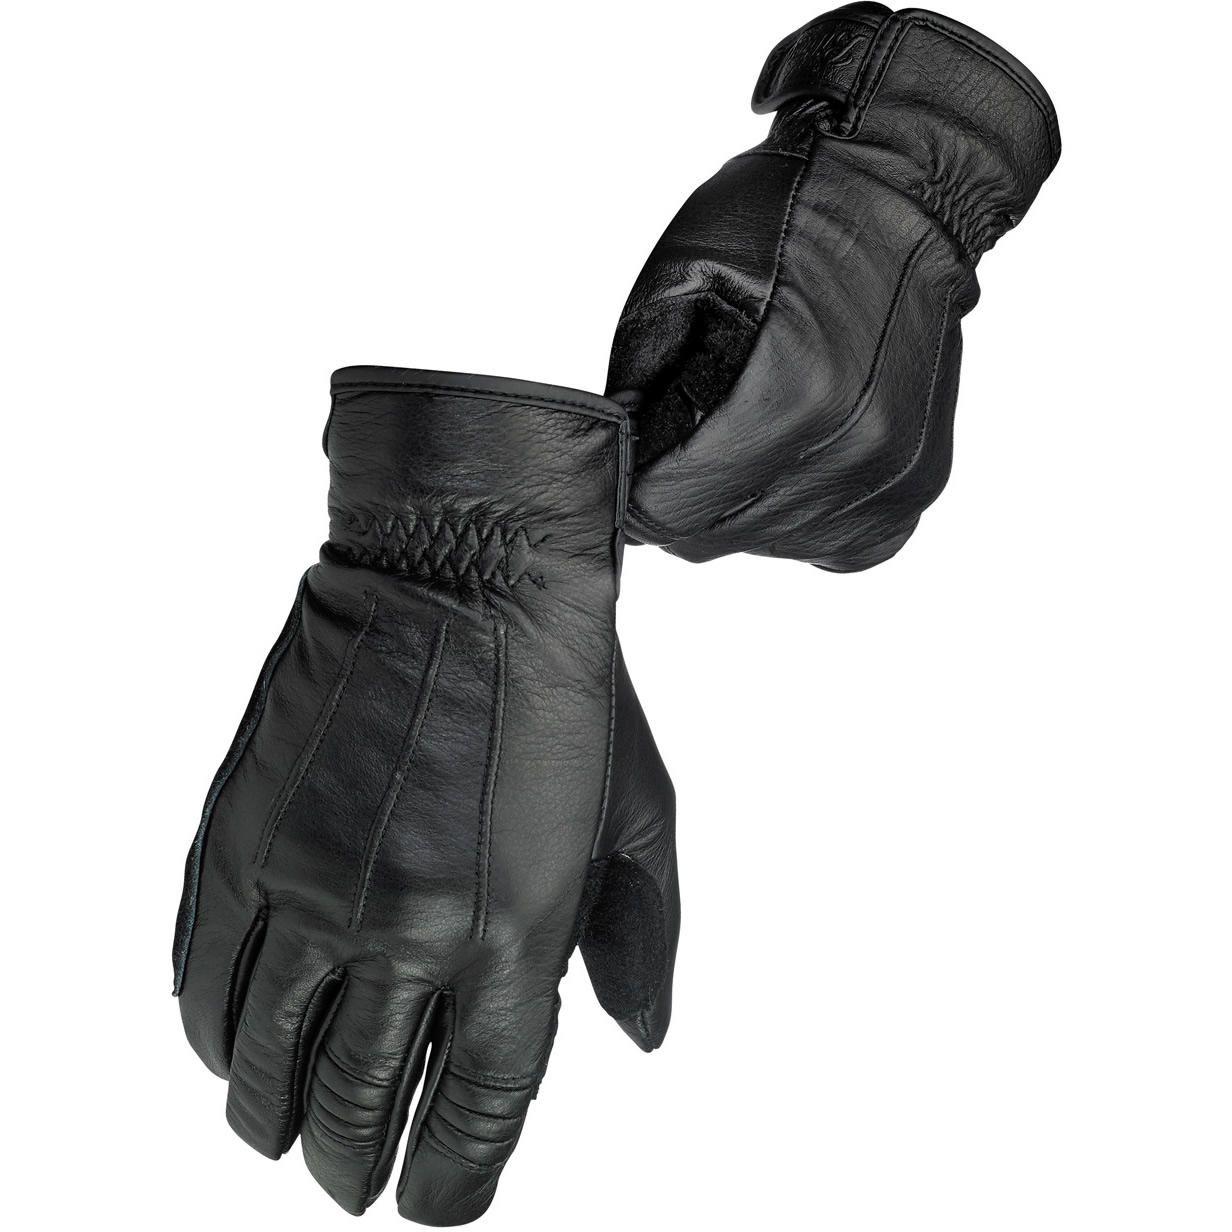 Leather work gloves ebay - Work Leather Cruiser Custom Cafe Racer Retro Motorcycle Gloves Ebay